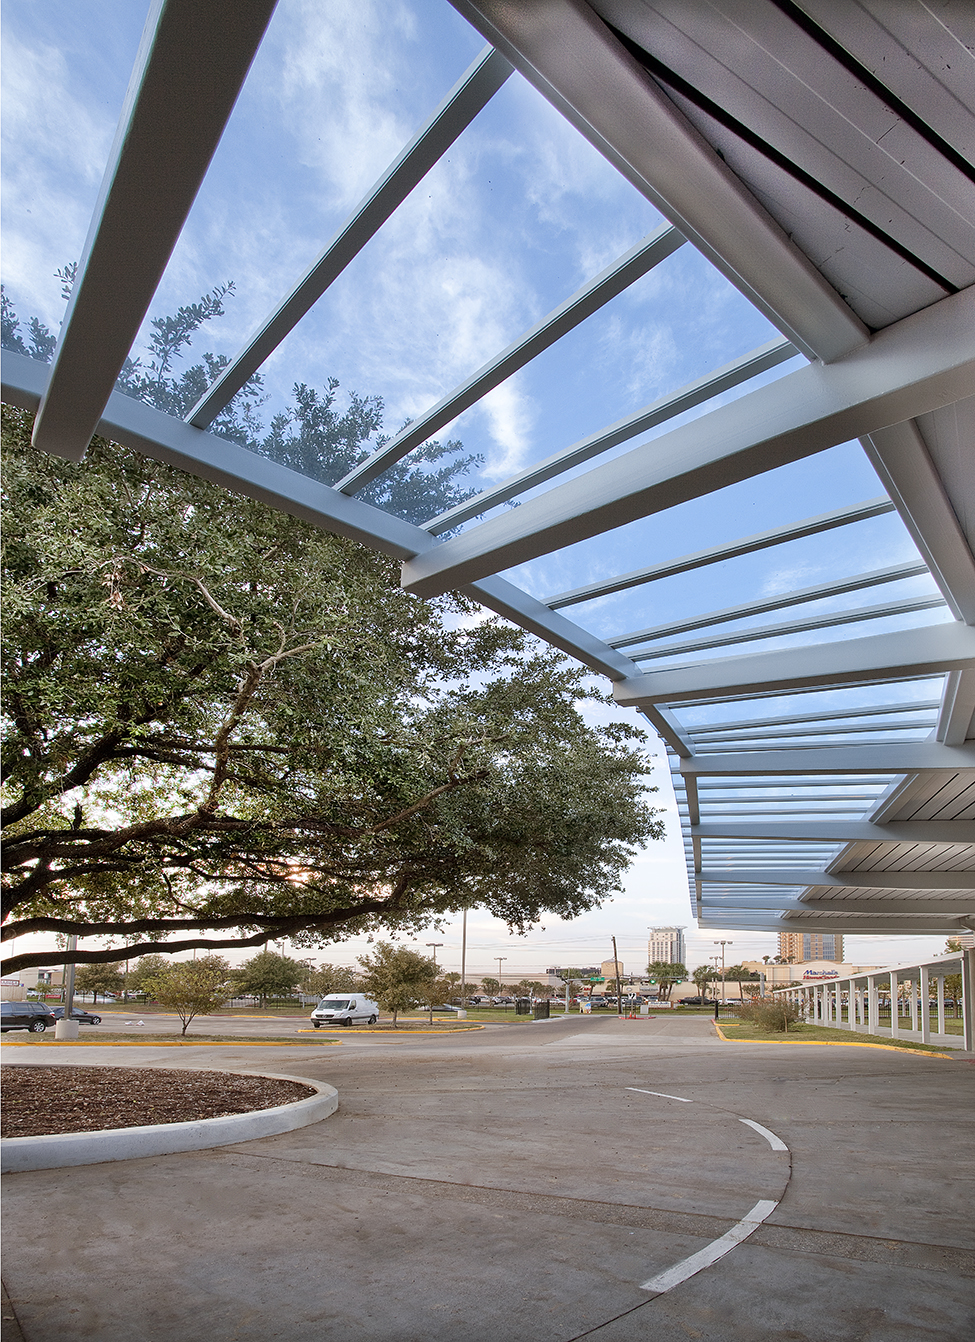 cpi daylighting canopy